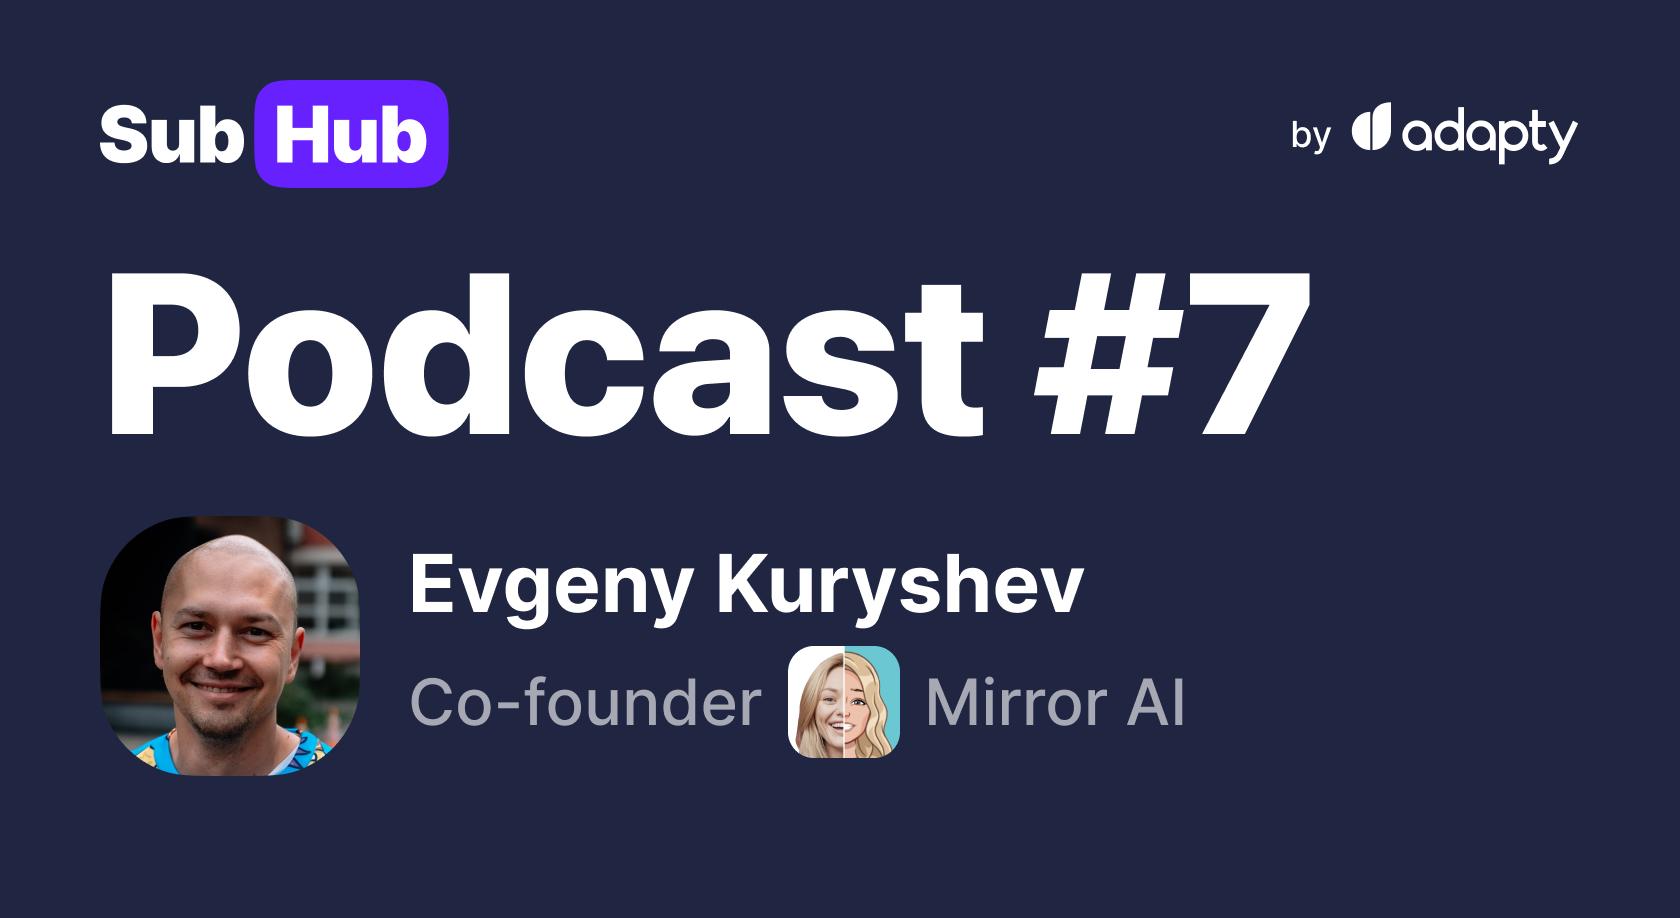 #7 SubHub Podcast: Evgeny Kuryshev from Mirror AI